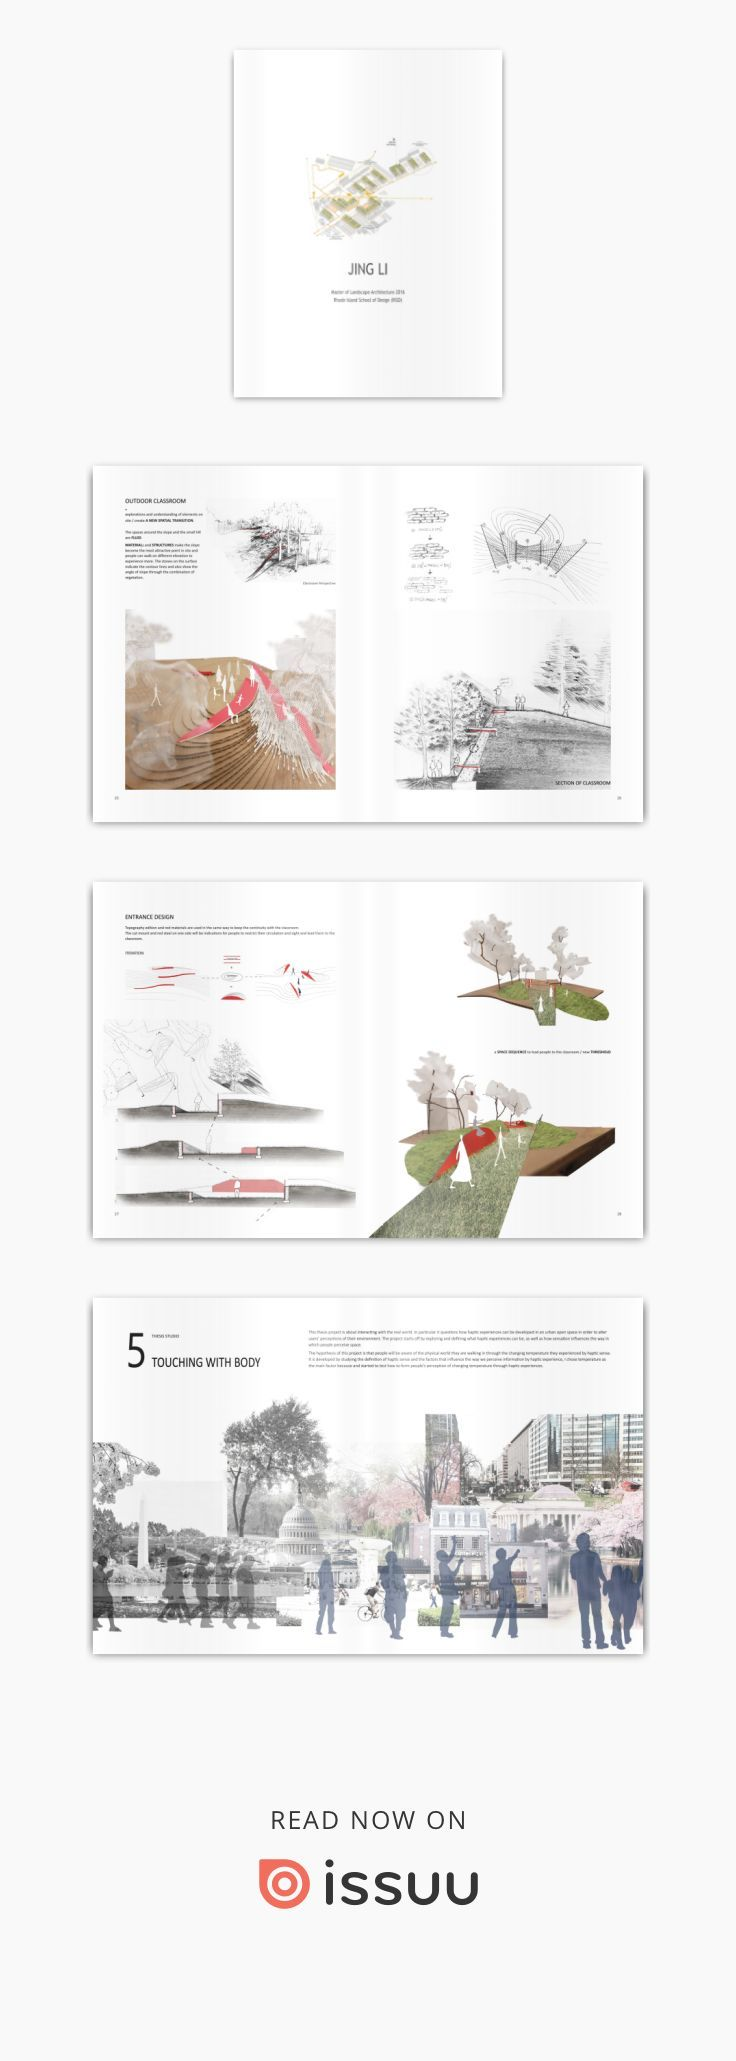 RISD LANDSCAPE PORTFOLIO - JING LI